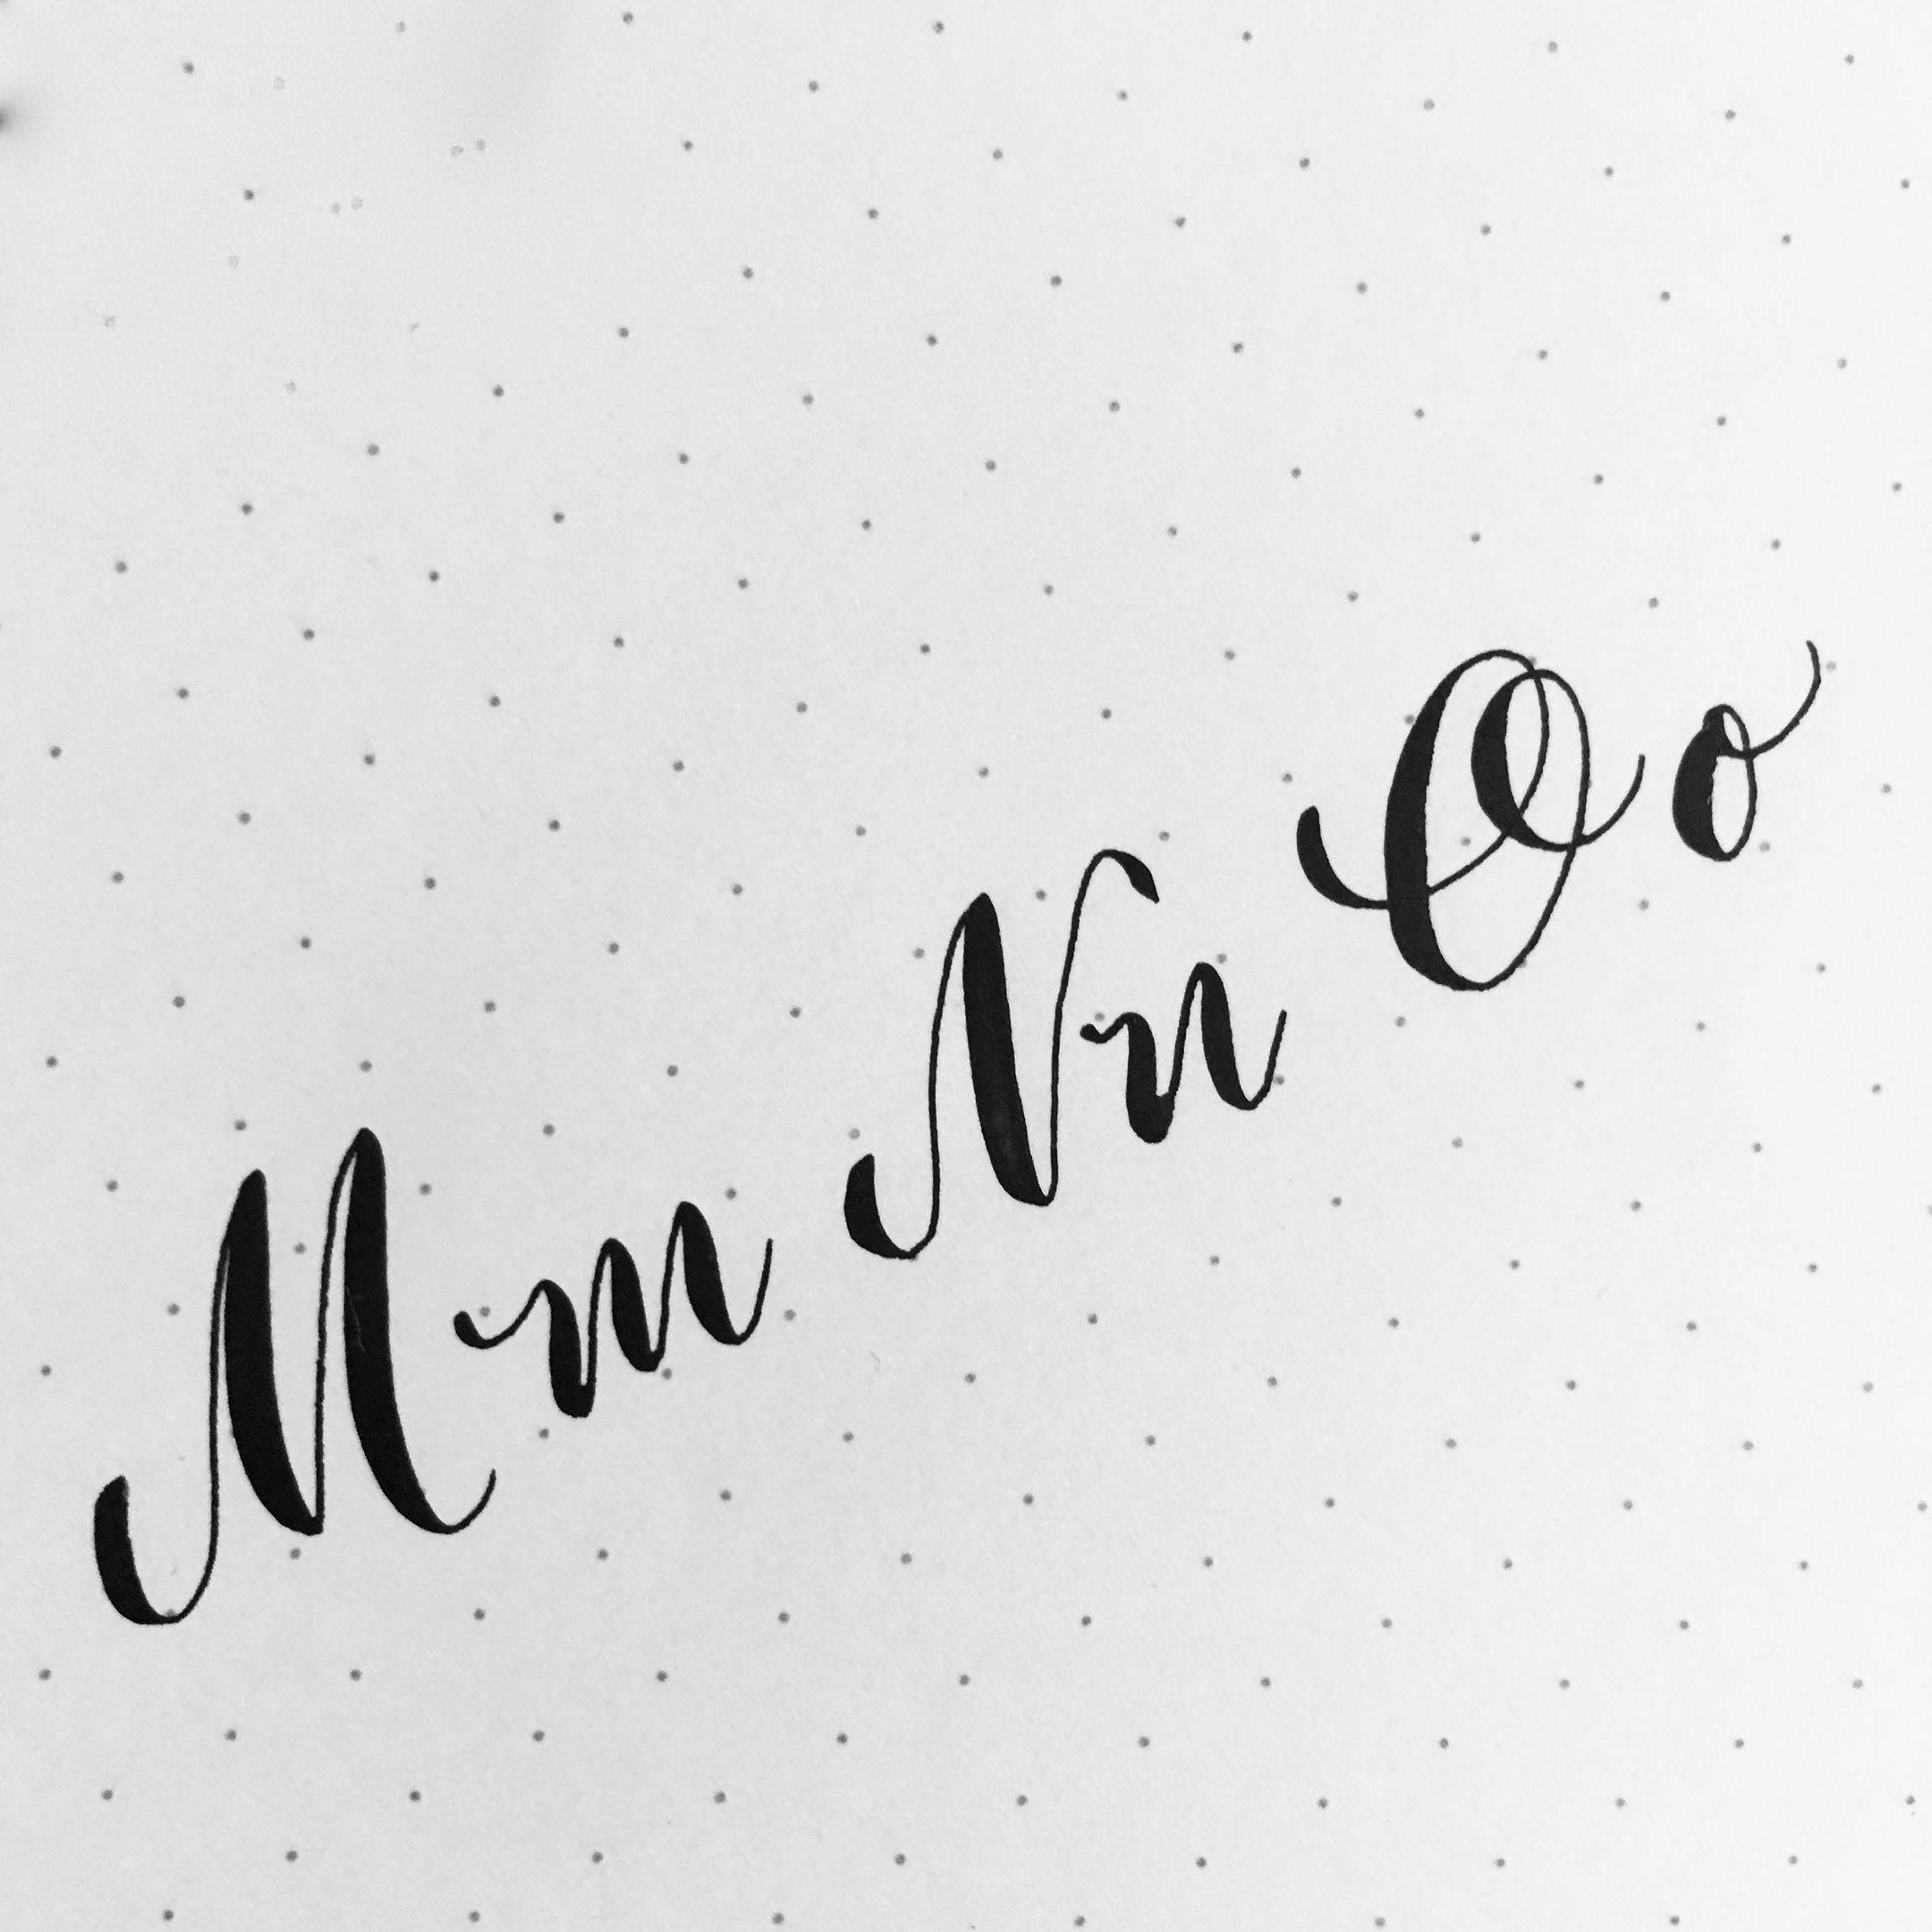 calligraphy_M_through_O.jpg